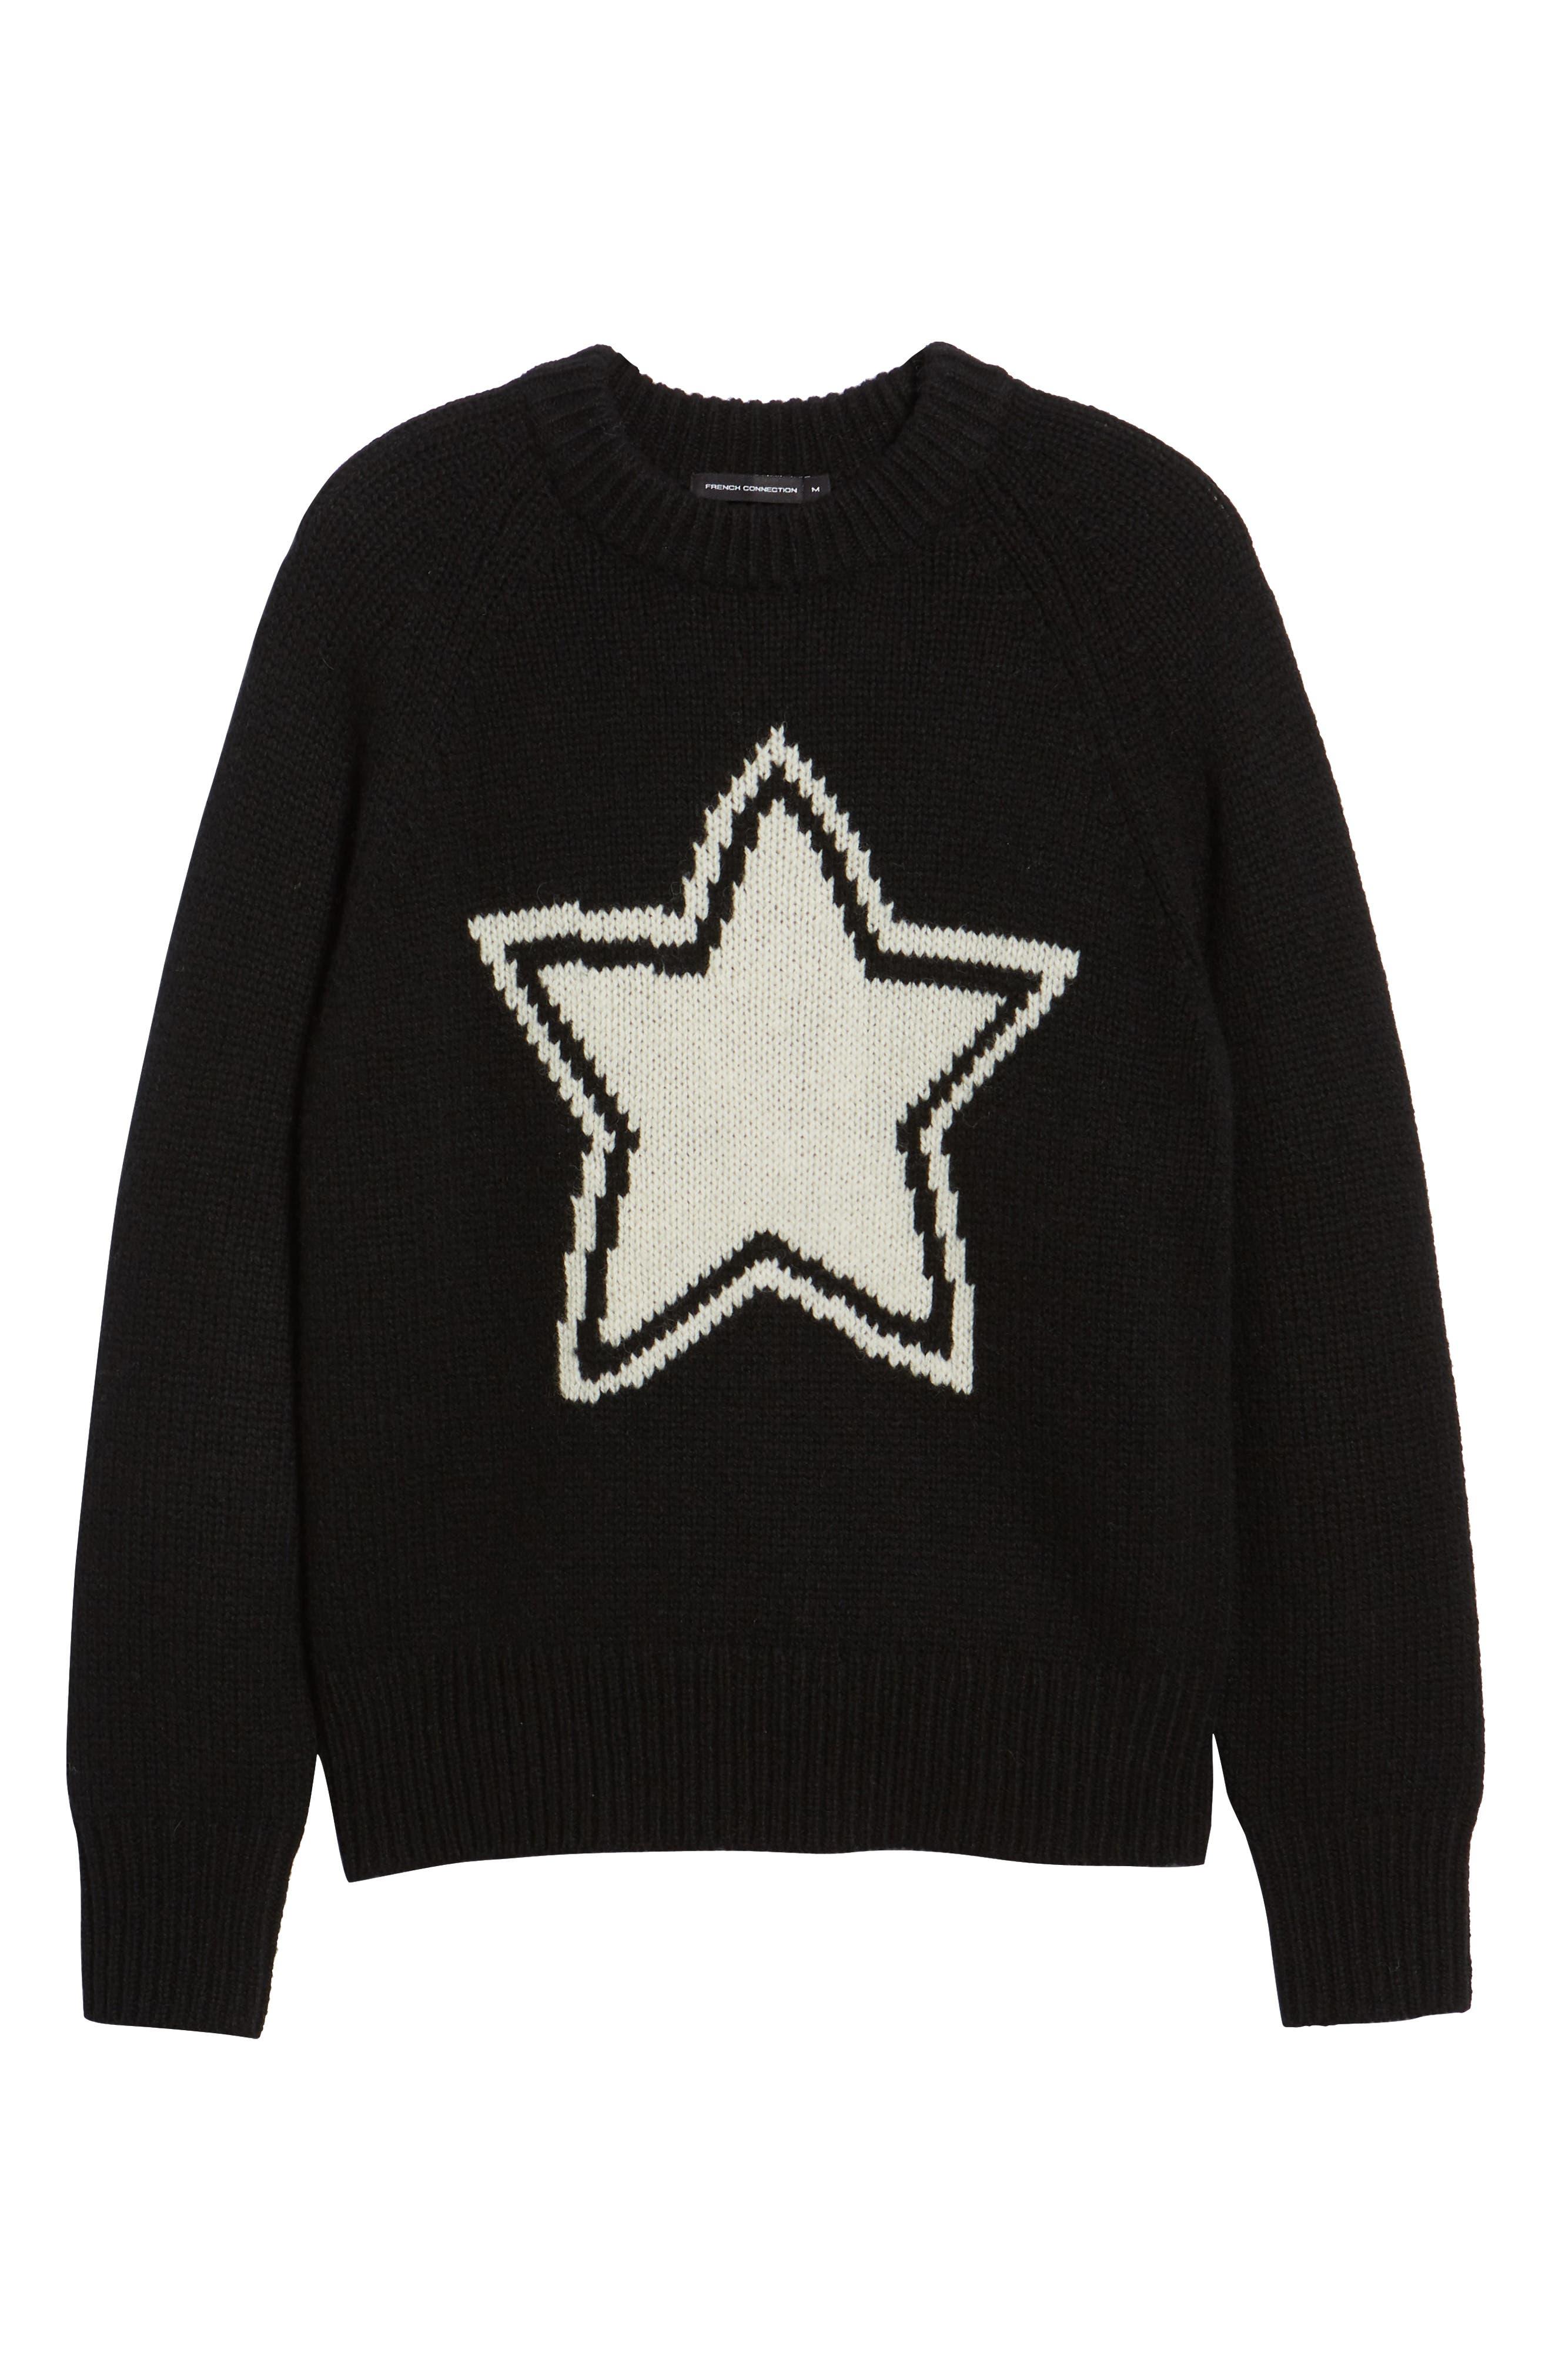 Star Wool Sweater,                             Alternate thumbnail 6, color,                             BLACK WHITECAP GREY